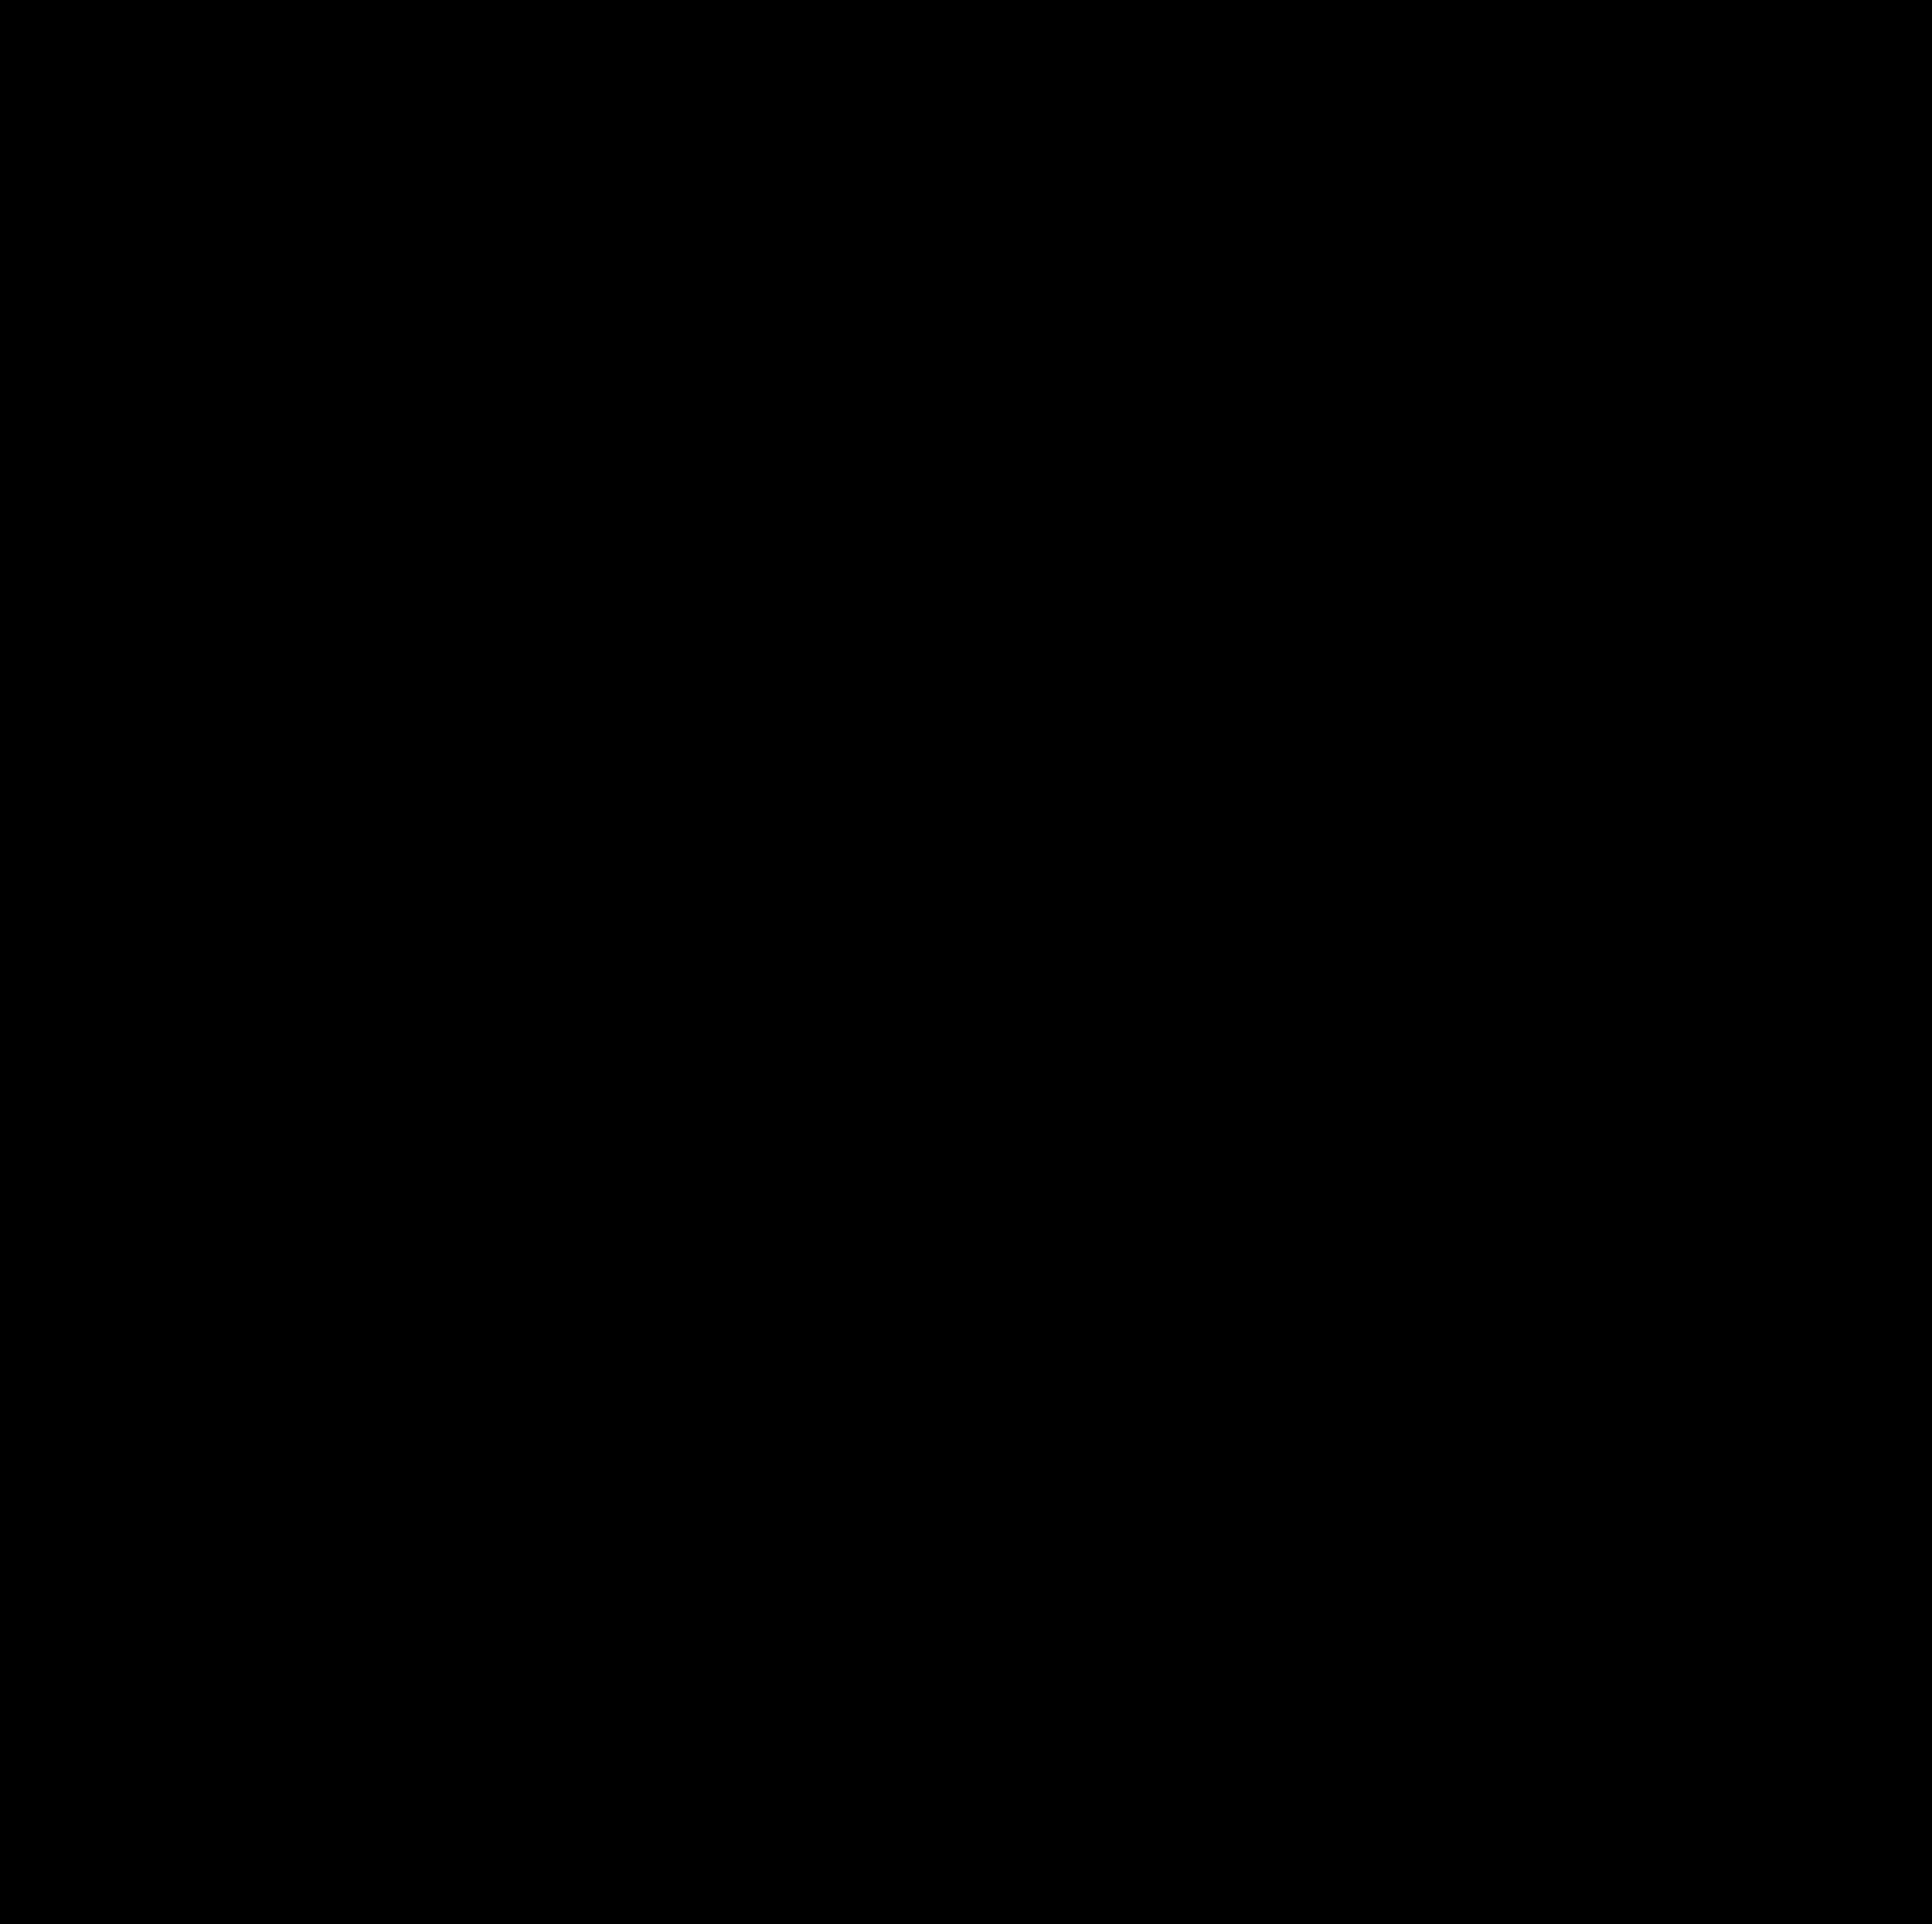 2328x2318 Clipart